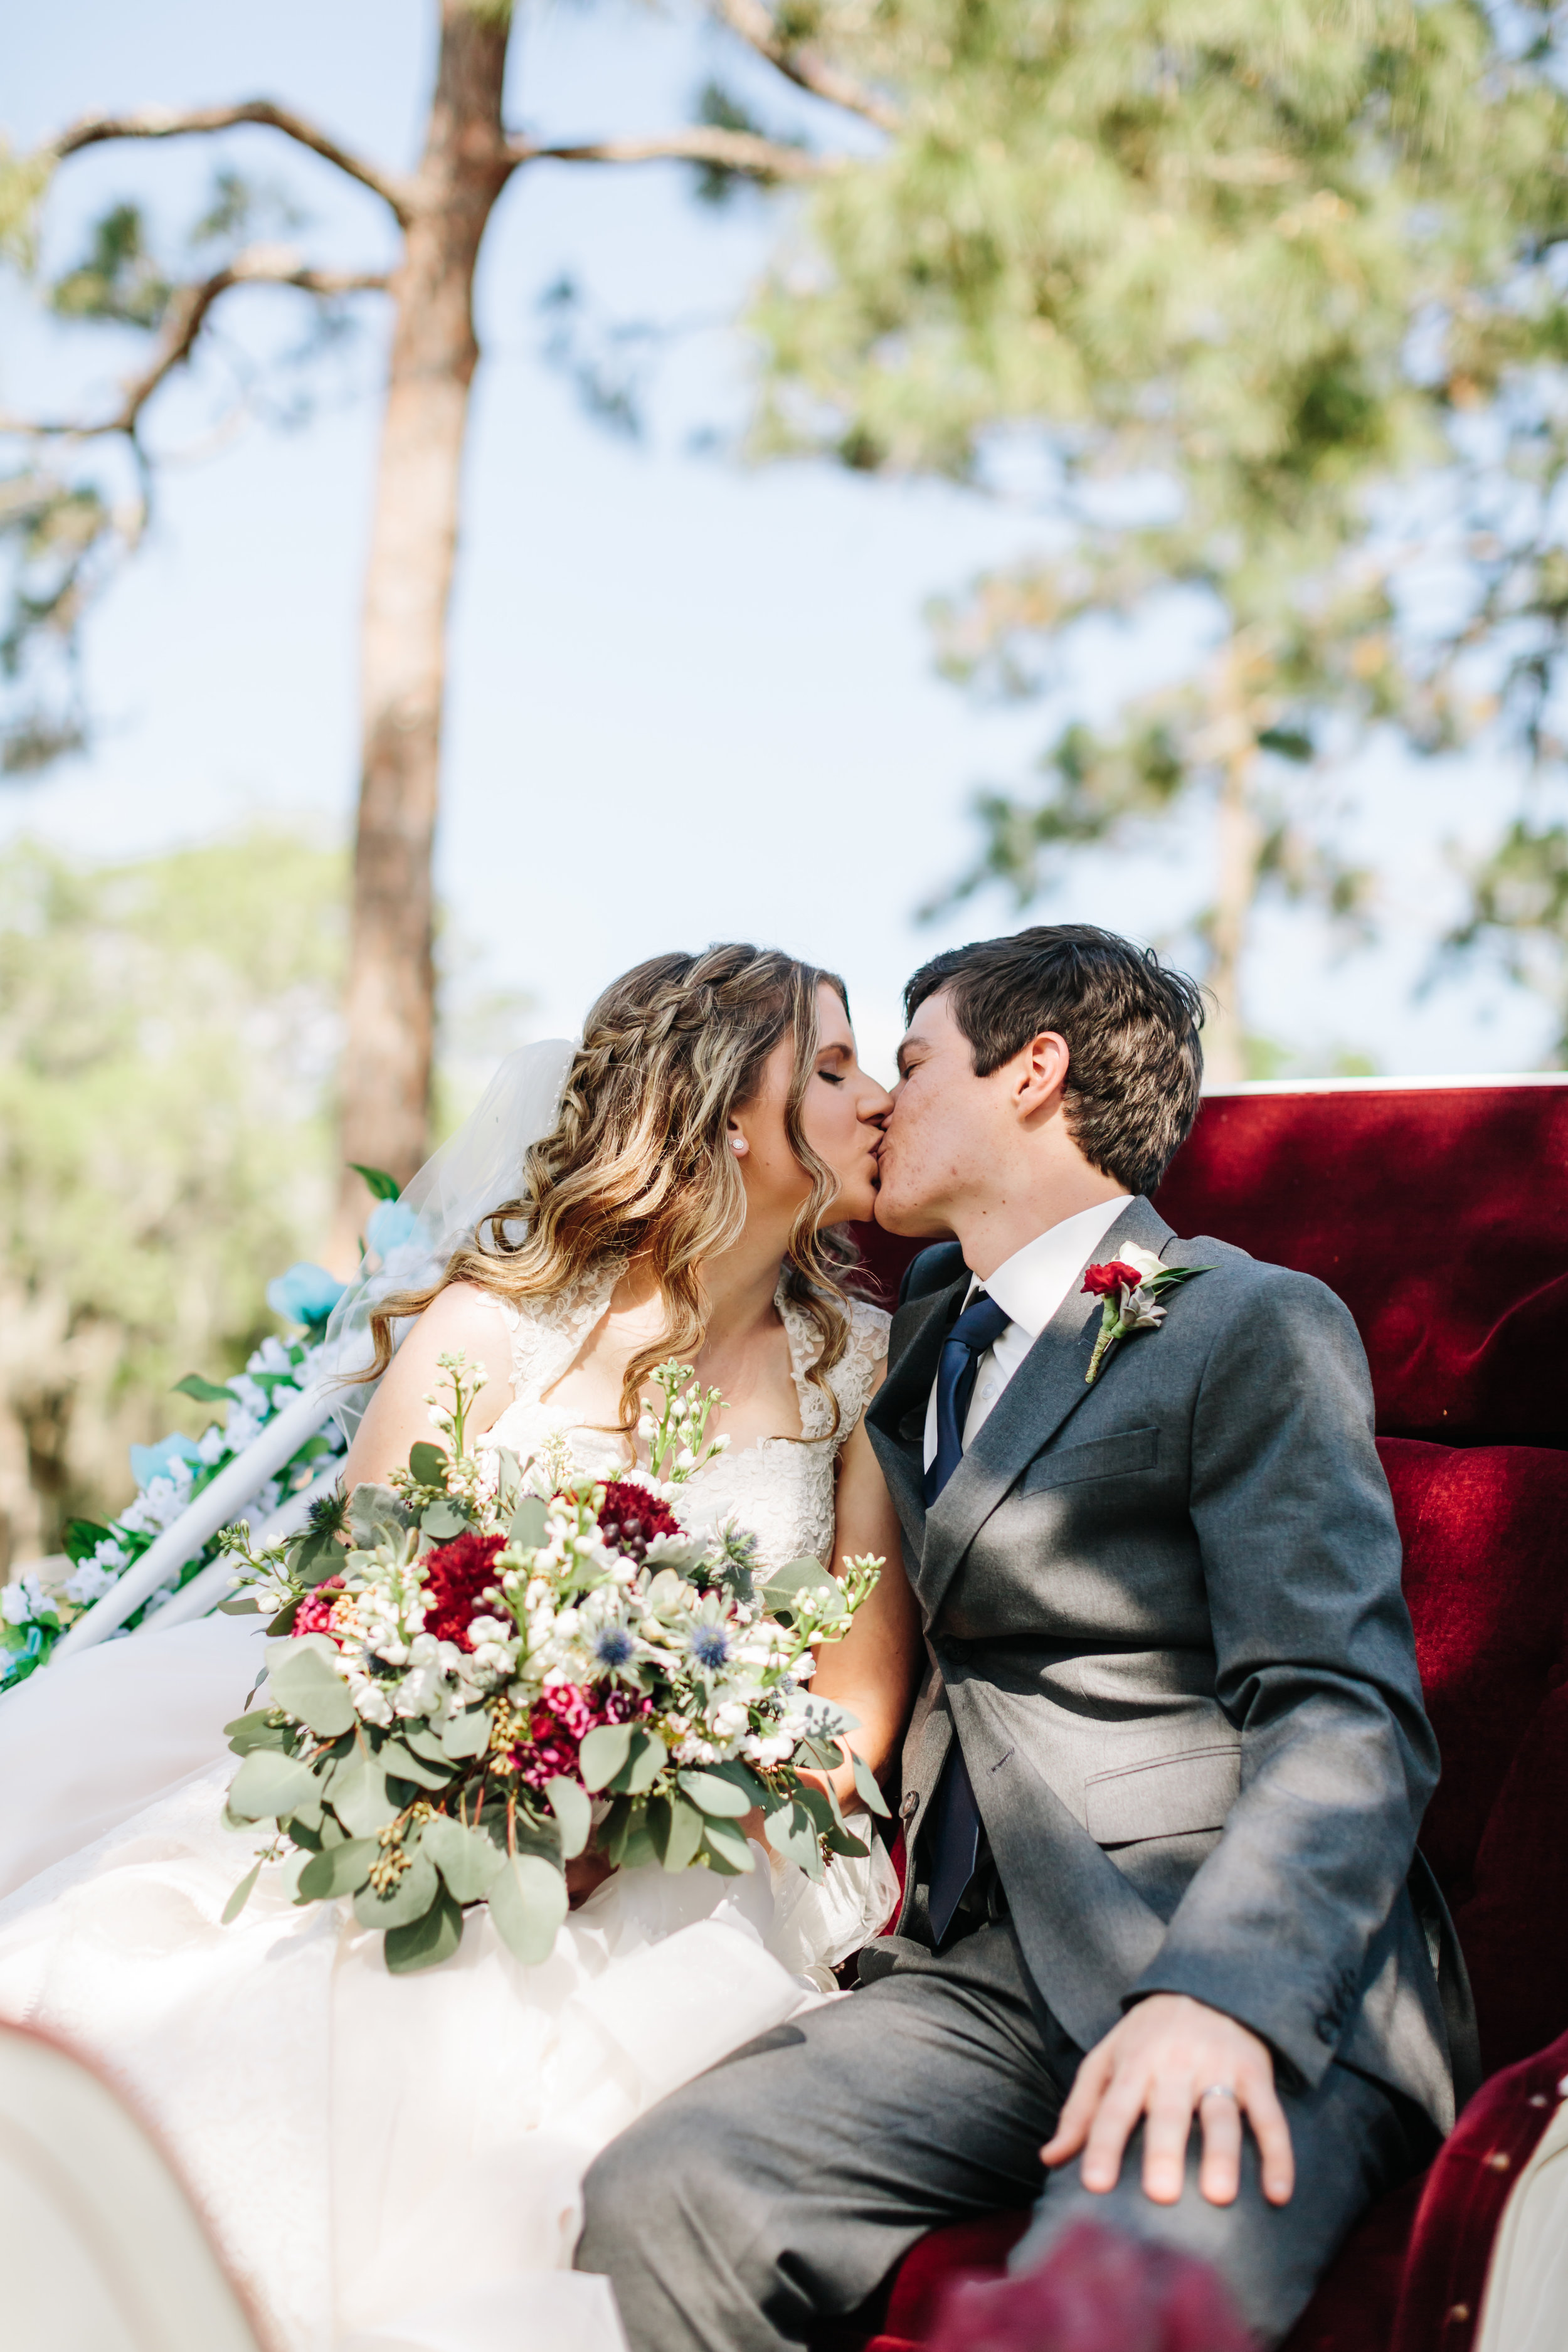 2018.04.14 Zak and Jamisyn Unrue Black Willow Barn Wedding Finals-433.jpg